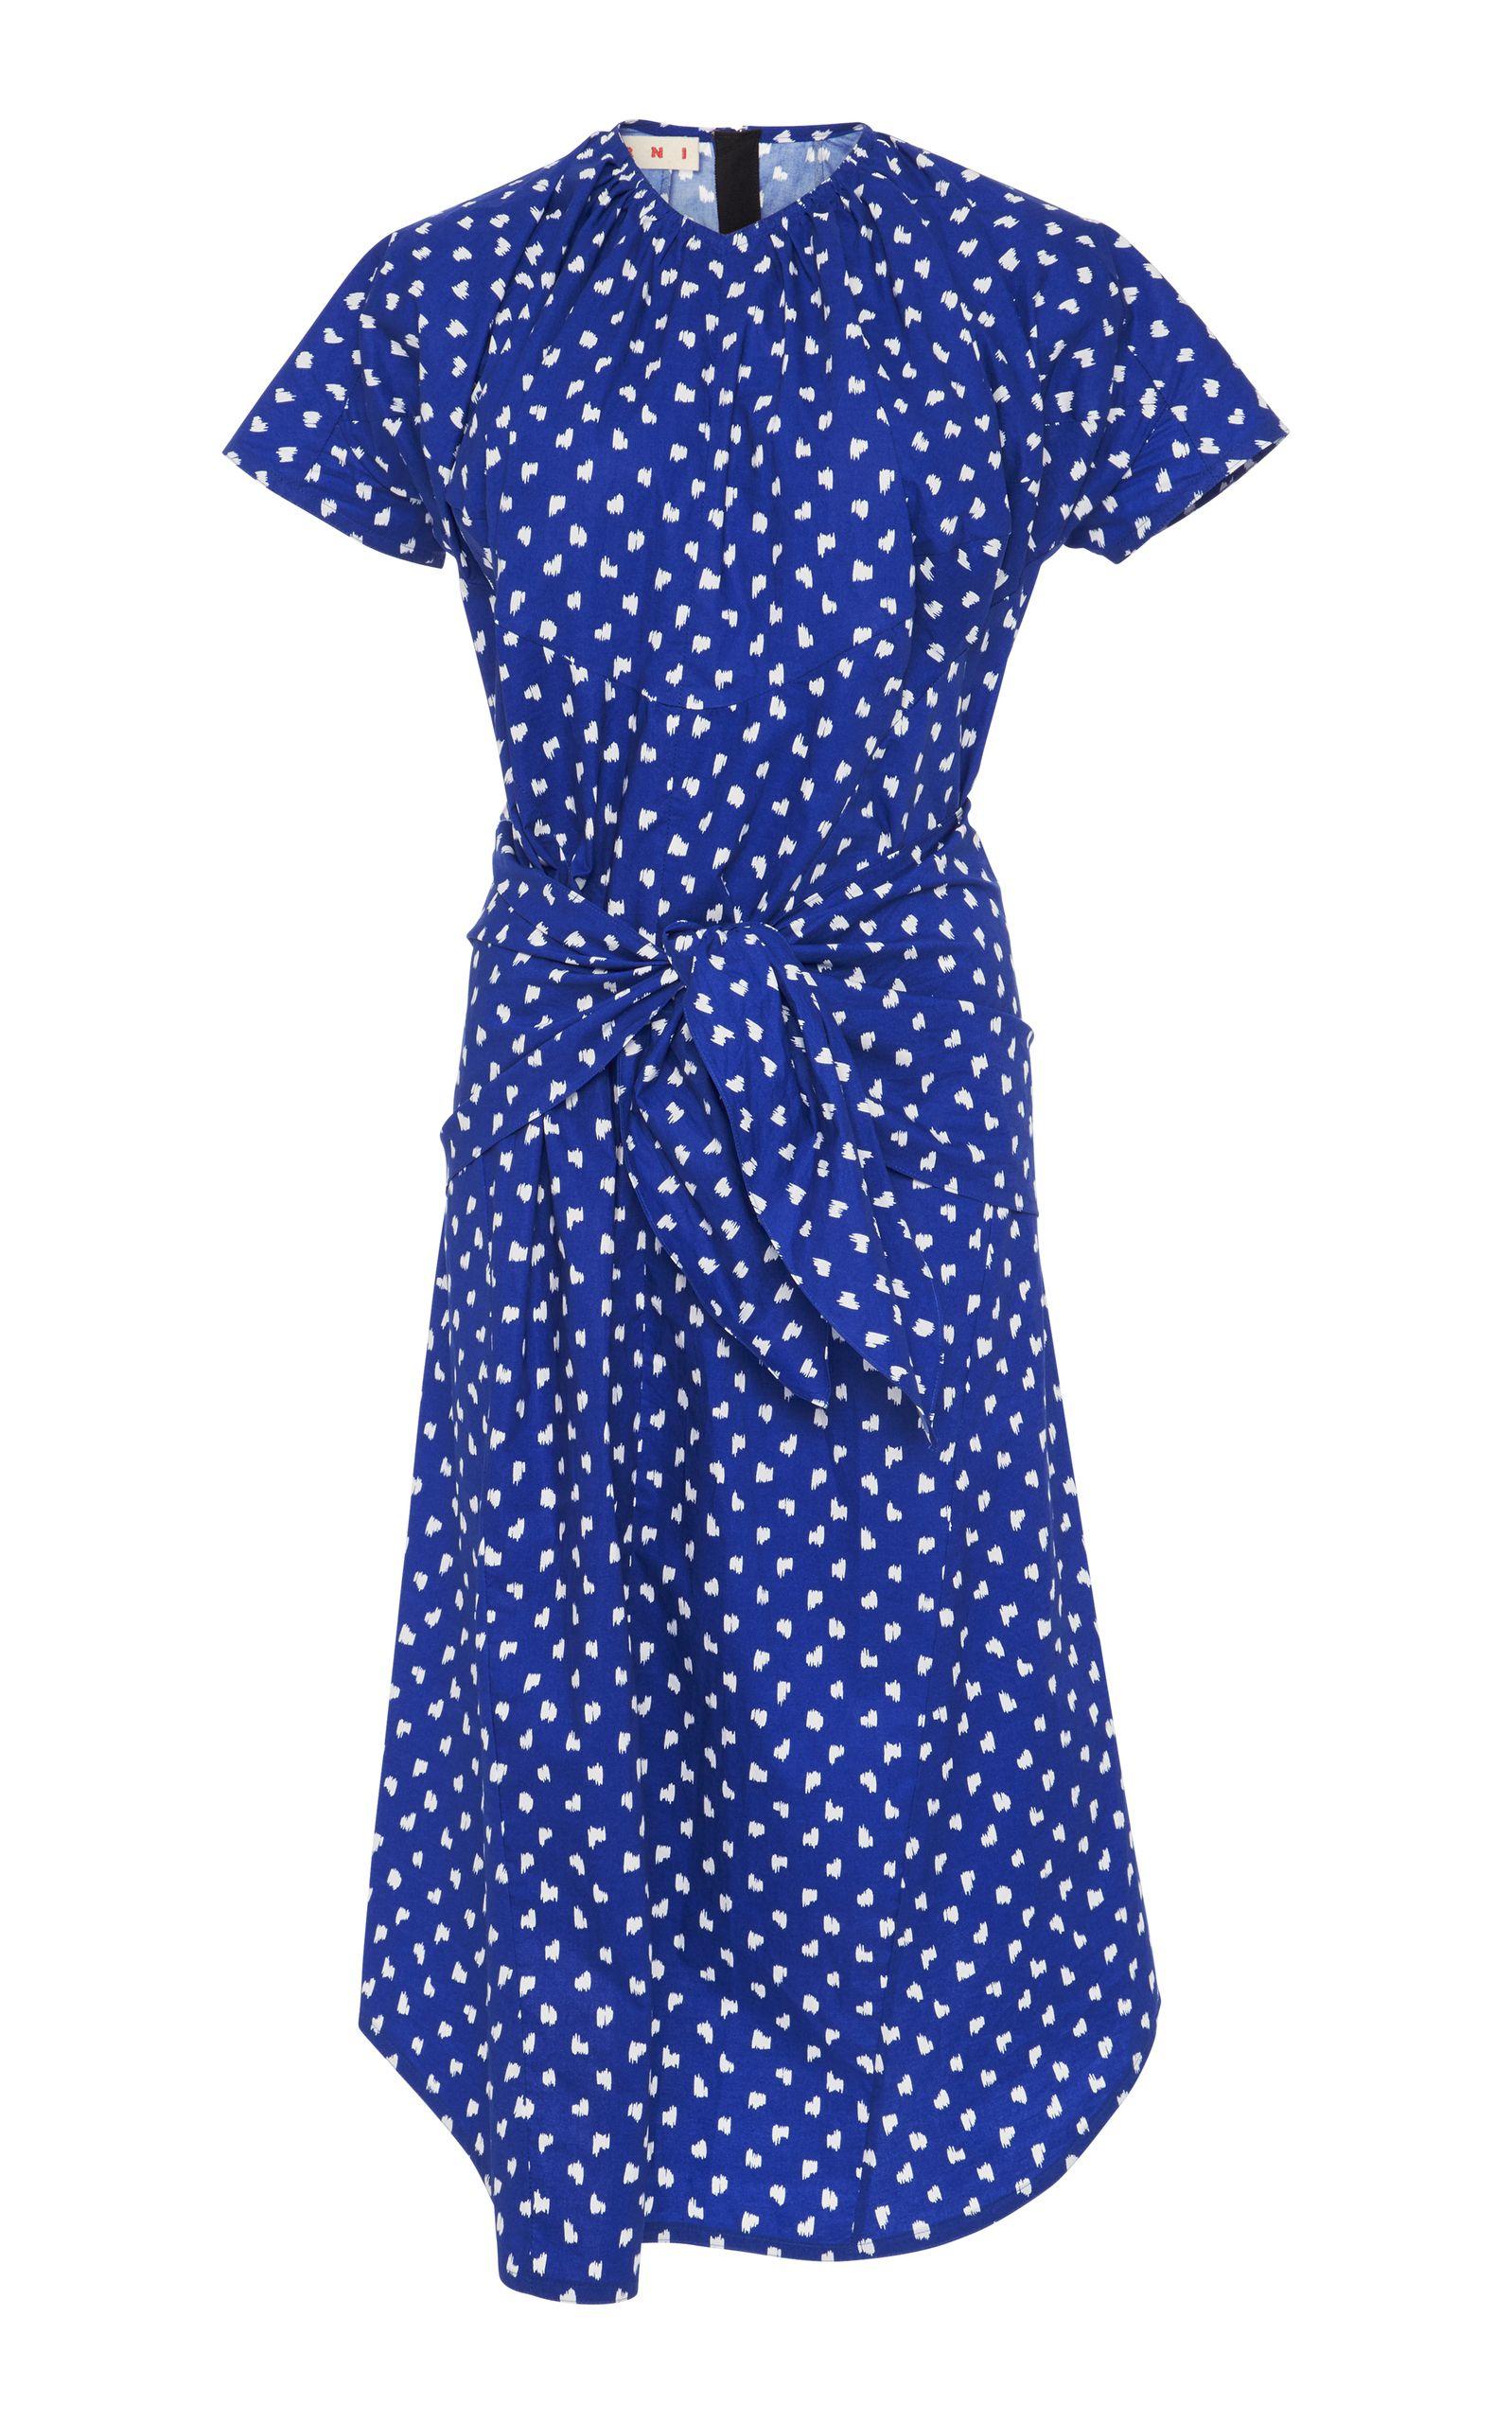 0b9a441d529a Short Sleeve Polka Dot Dress | Fashion Lust | Dresses, Marni, Poplin ...